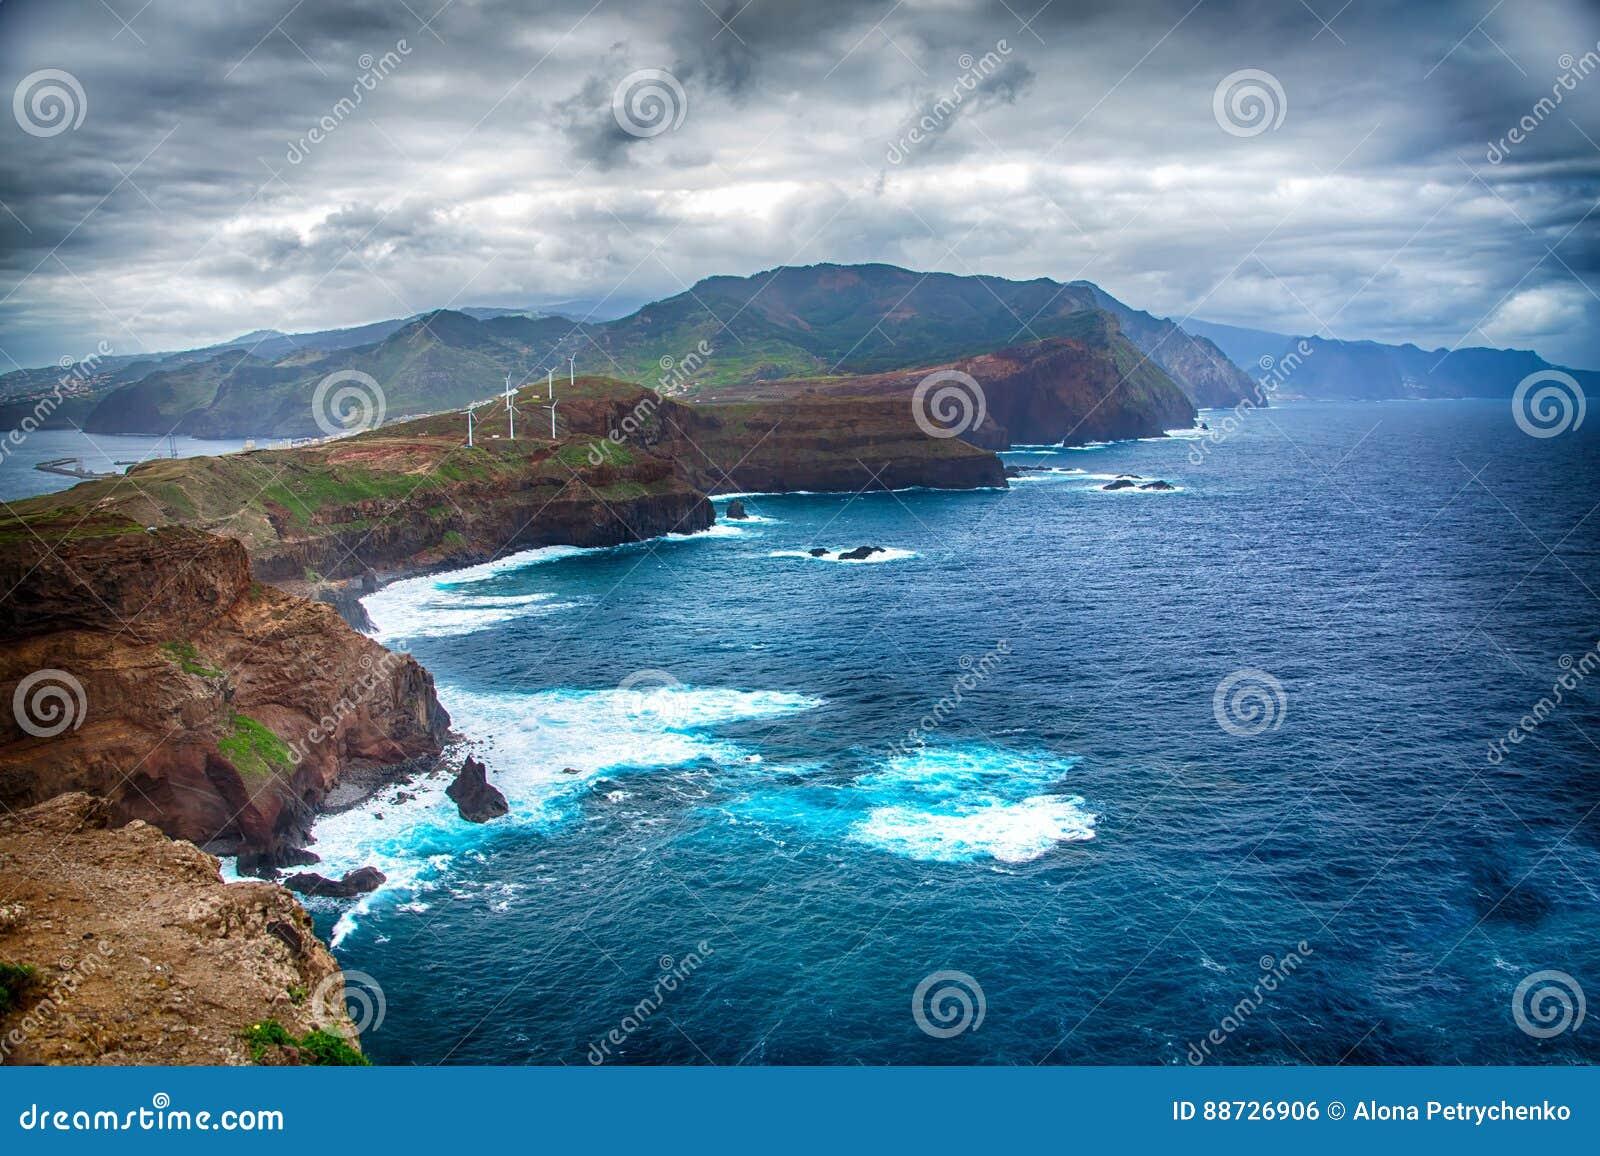 Голубые океан, горы, утесы, ветрянки и облачное небо